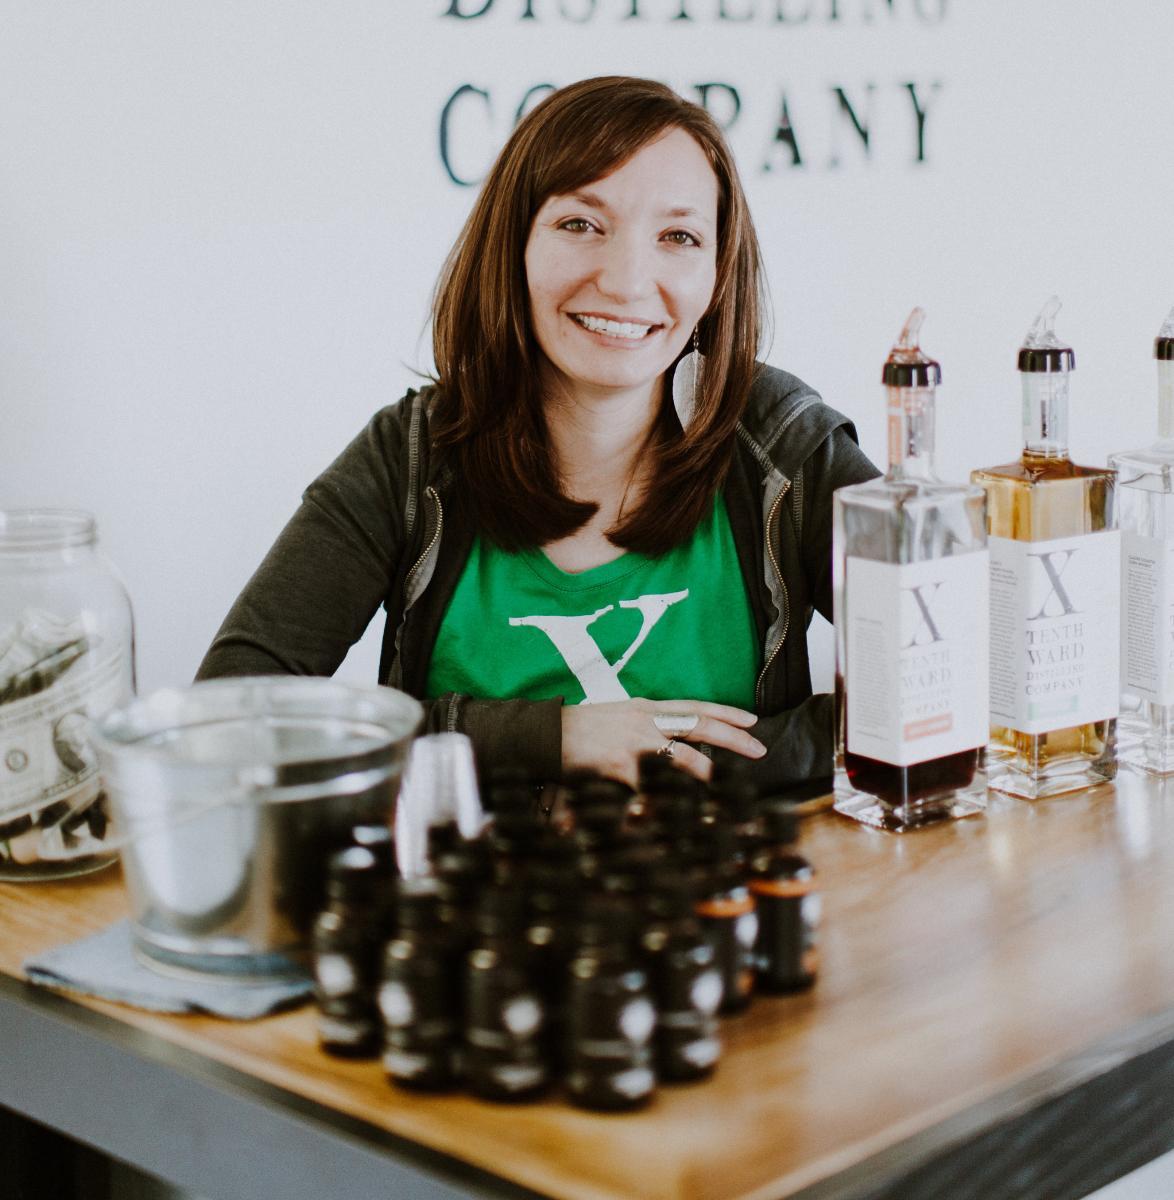 Tenth Ward Distilling's Monica Pearce